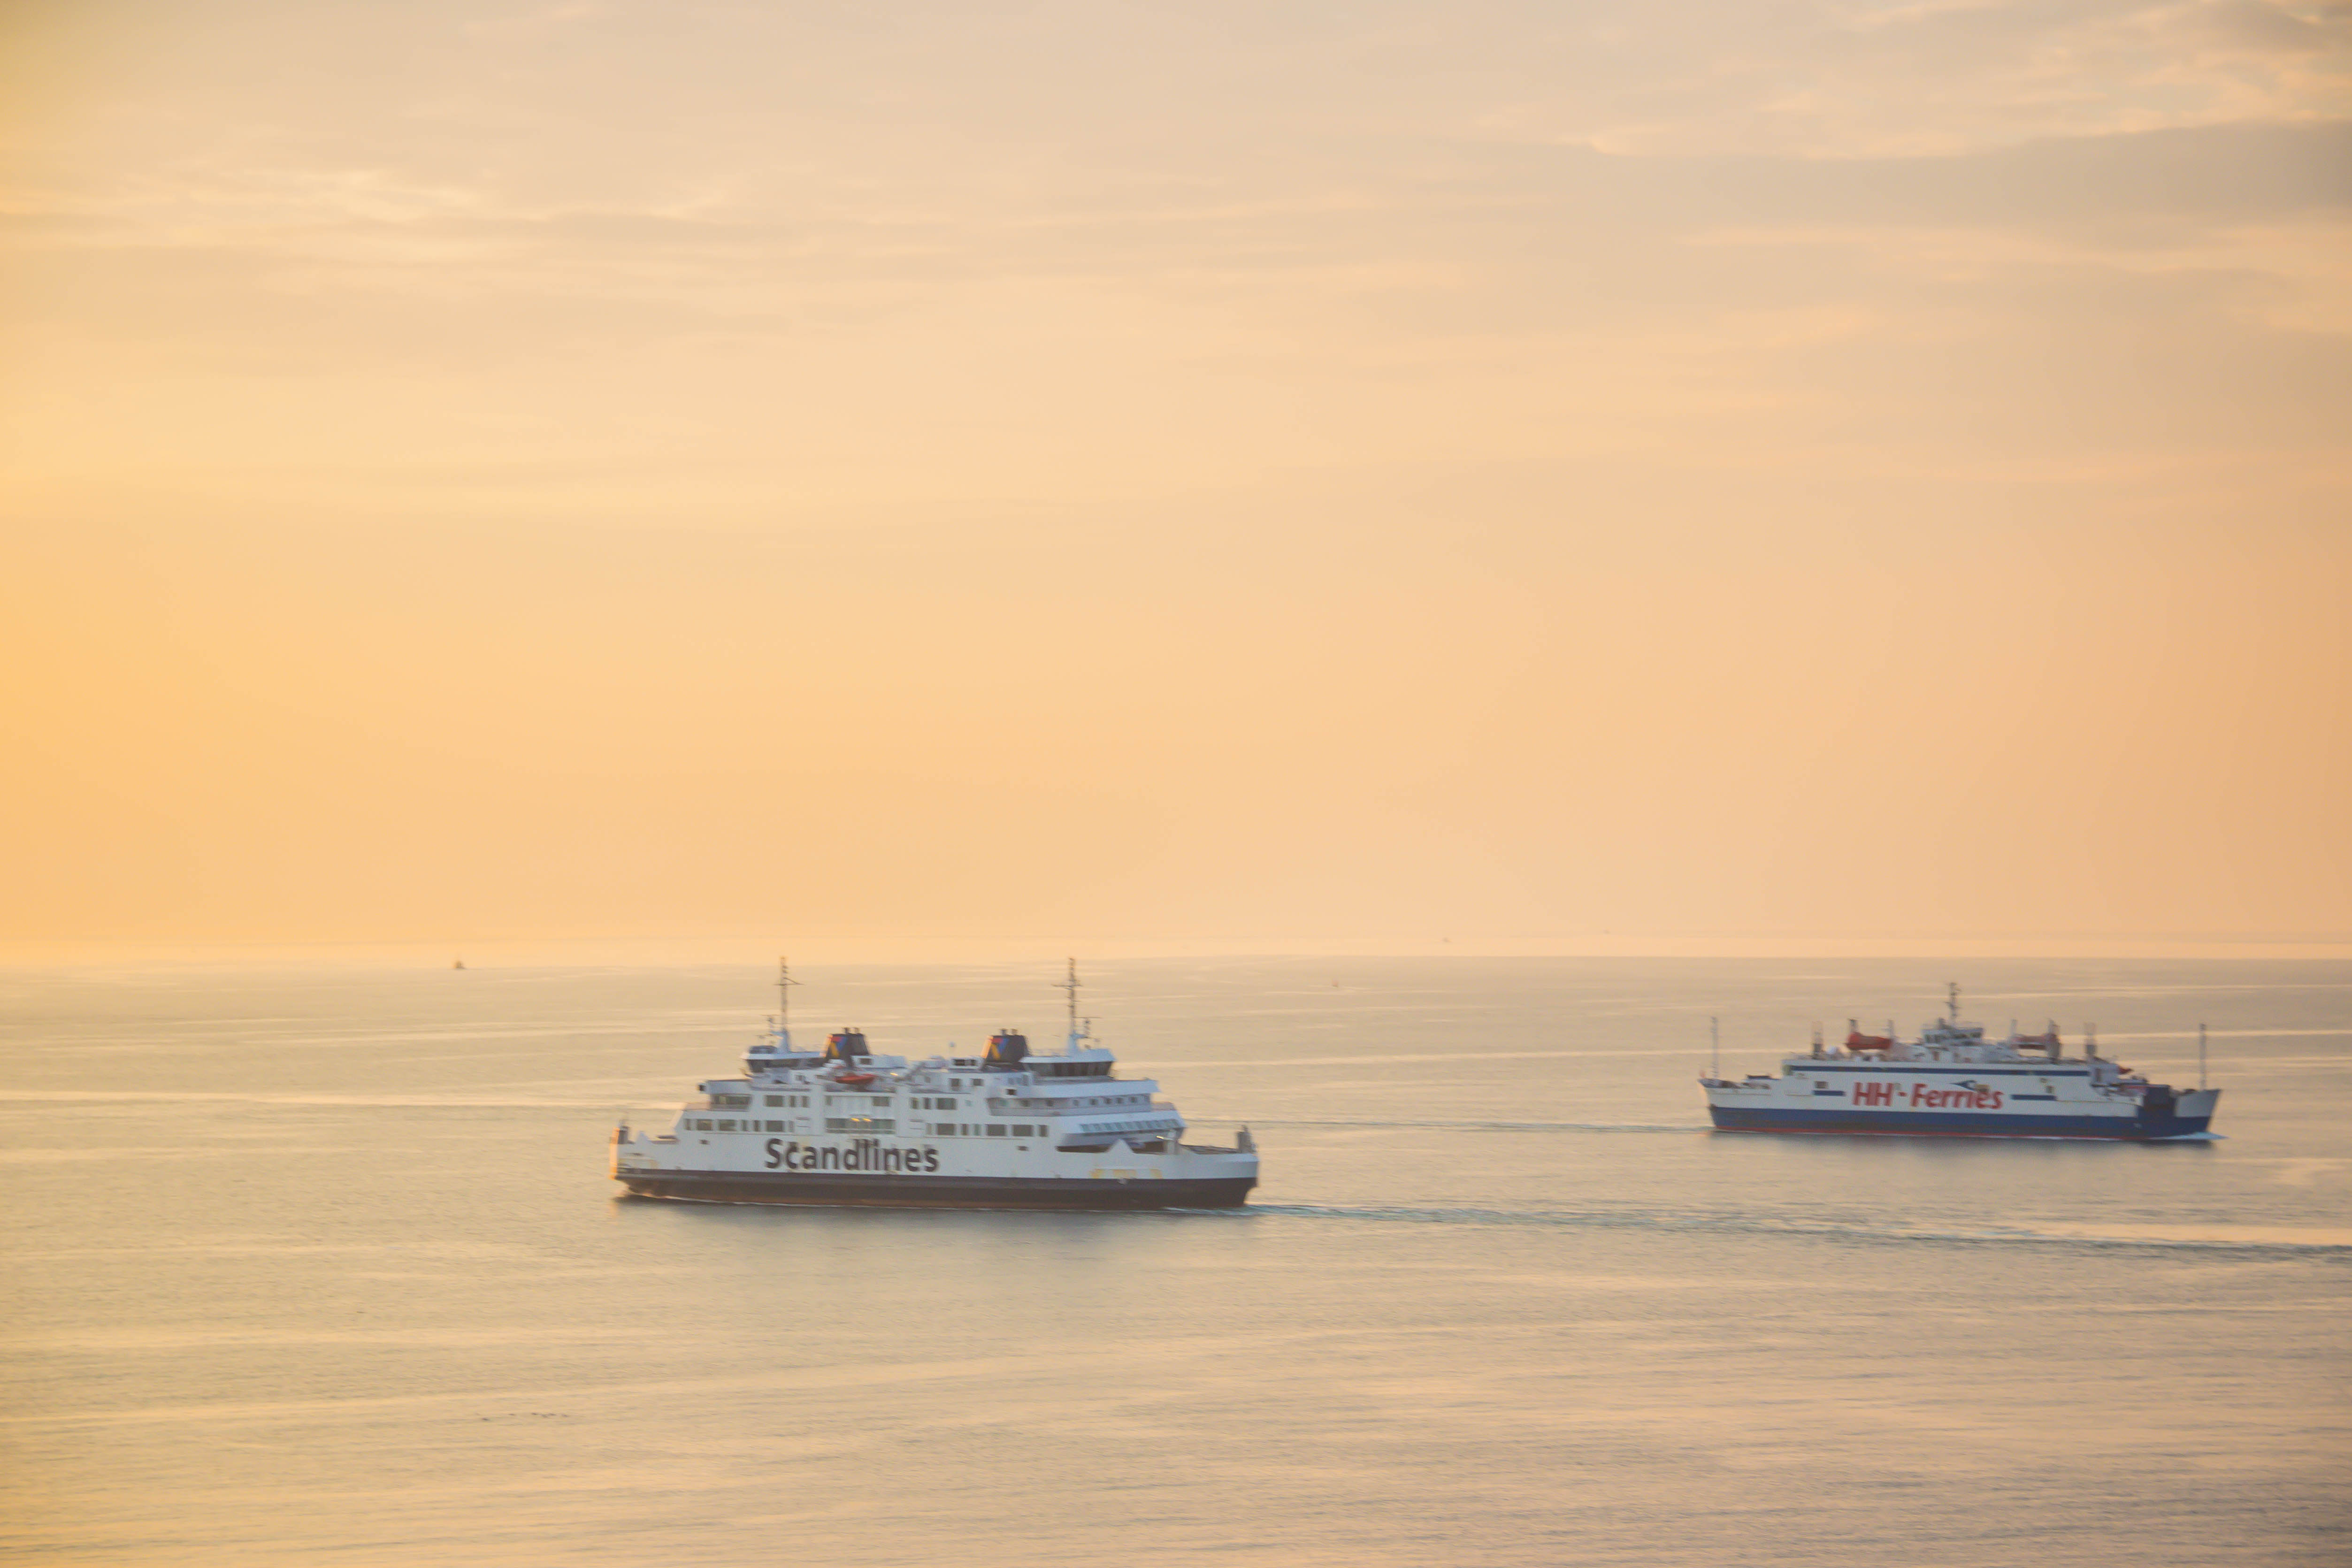 Ferries_at_golden_hour_(17430747961)